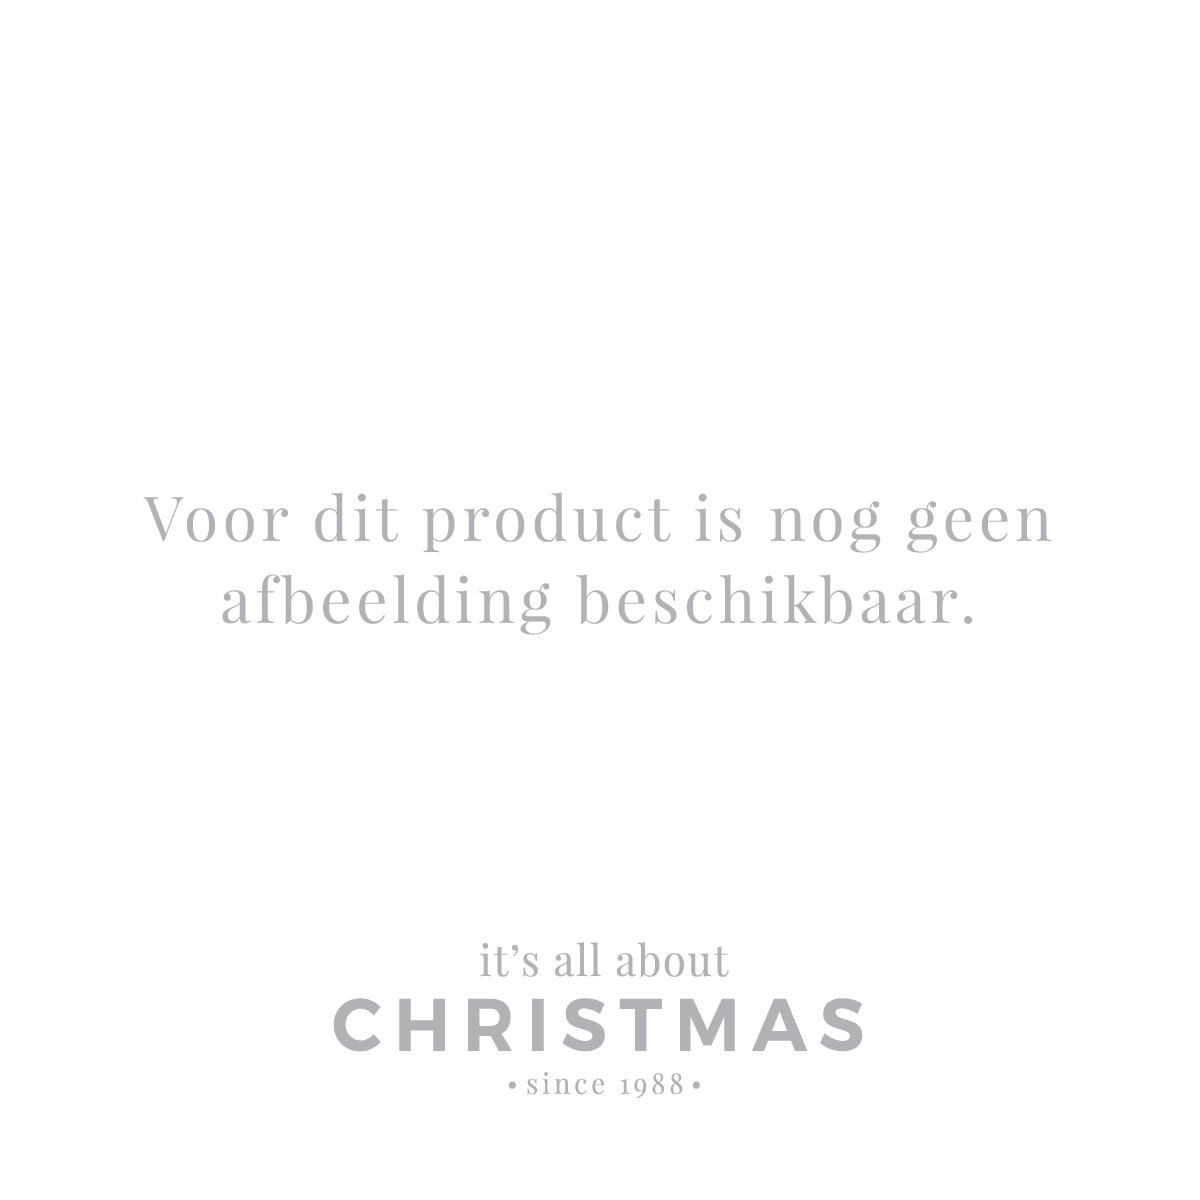 Christbaumkugeln Glas Kupfer.44 Christbaumkugeln Glas Kupfer Mix In Box It S All About Christmas